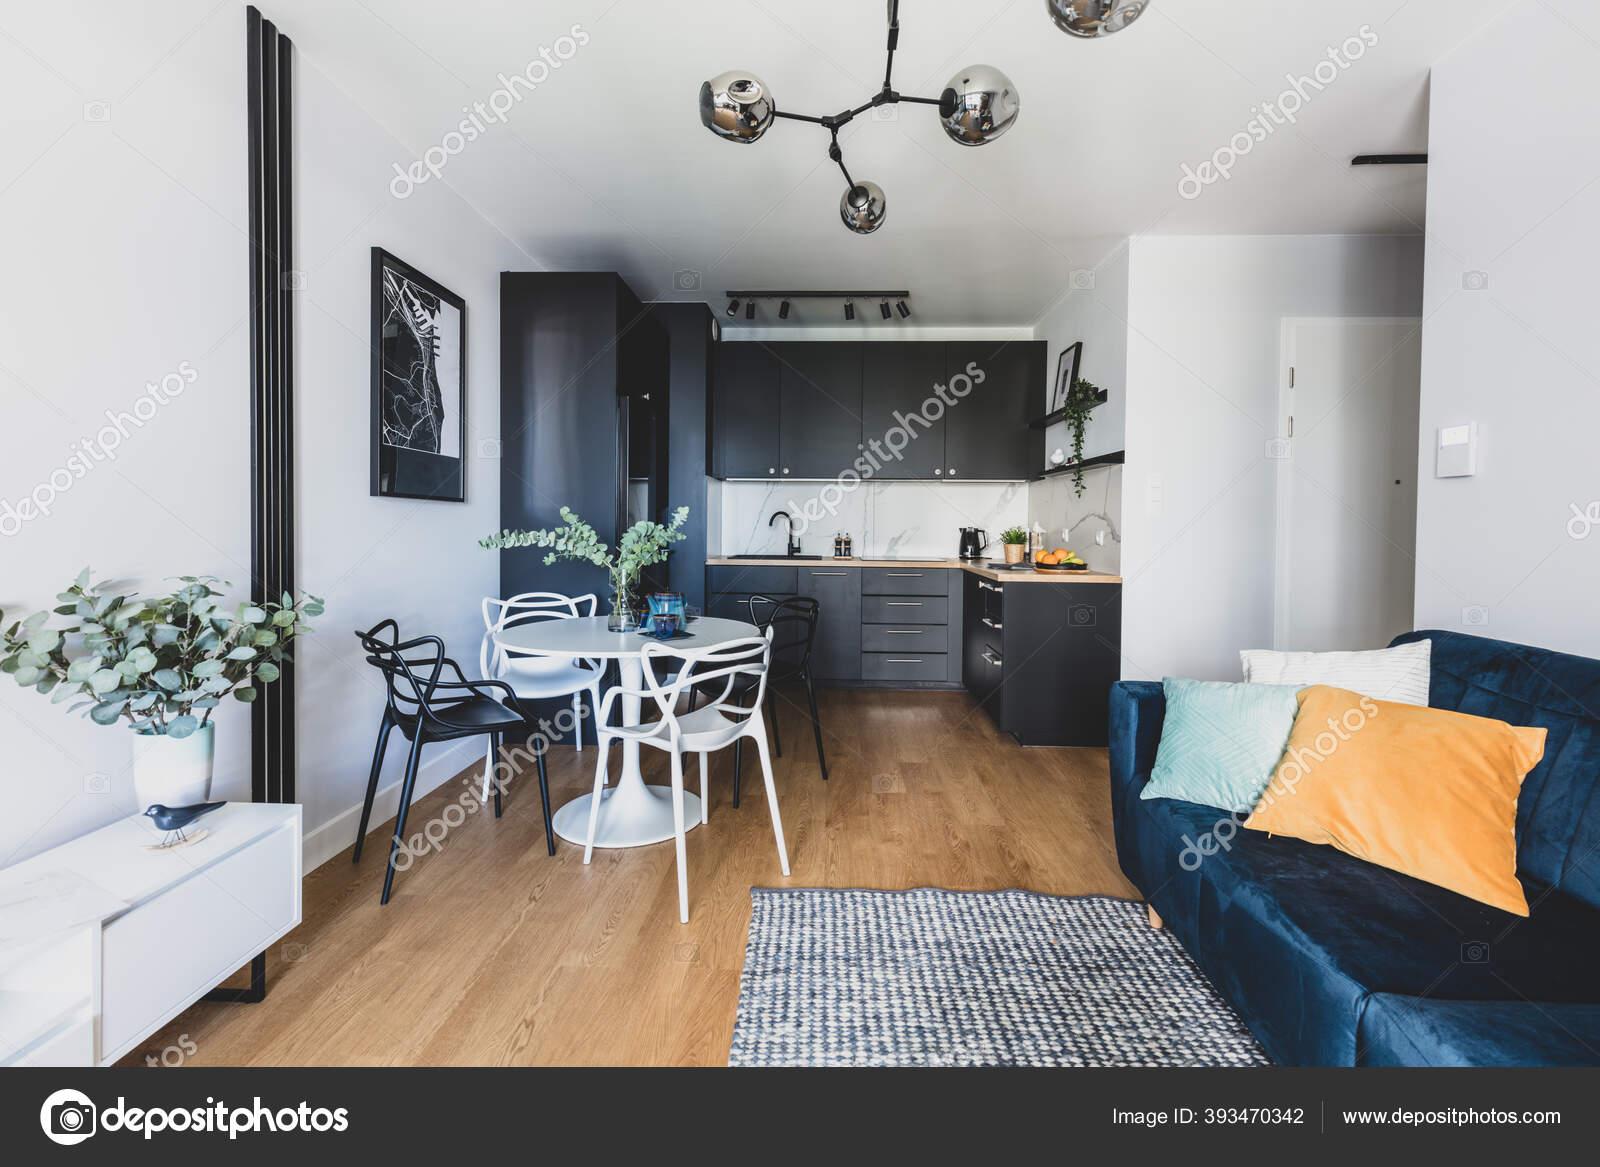 Living Room Kitchen Annexe Modern Studio Apartment Rent Interior Design Stock Photo C Photocreo 393470342